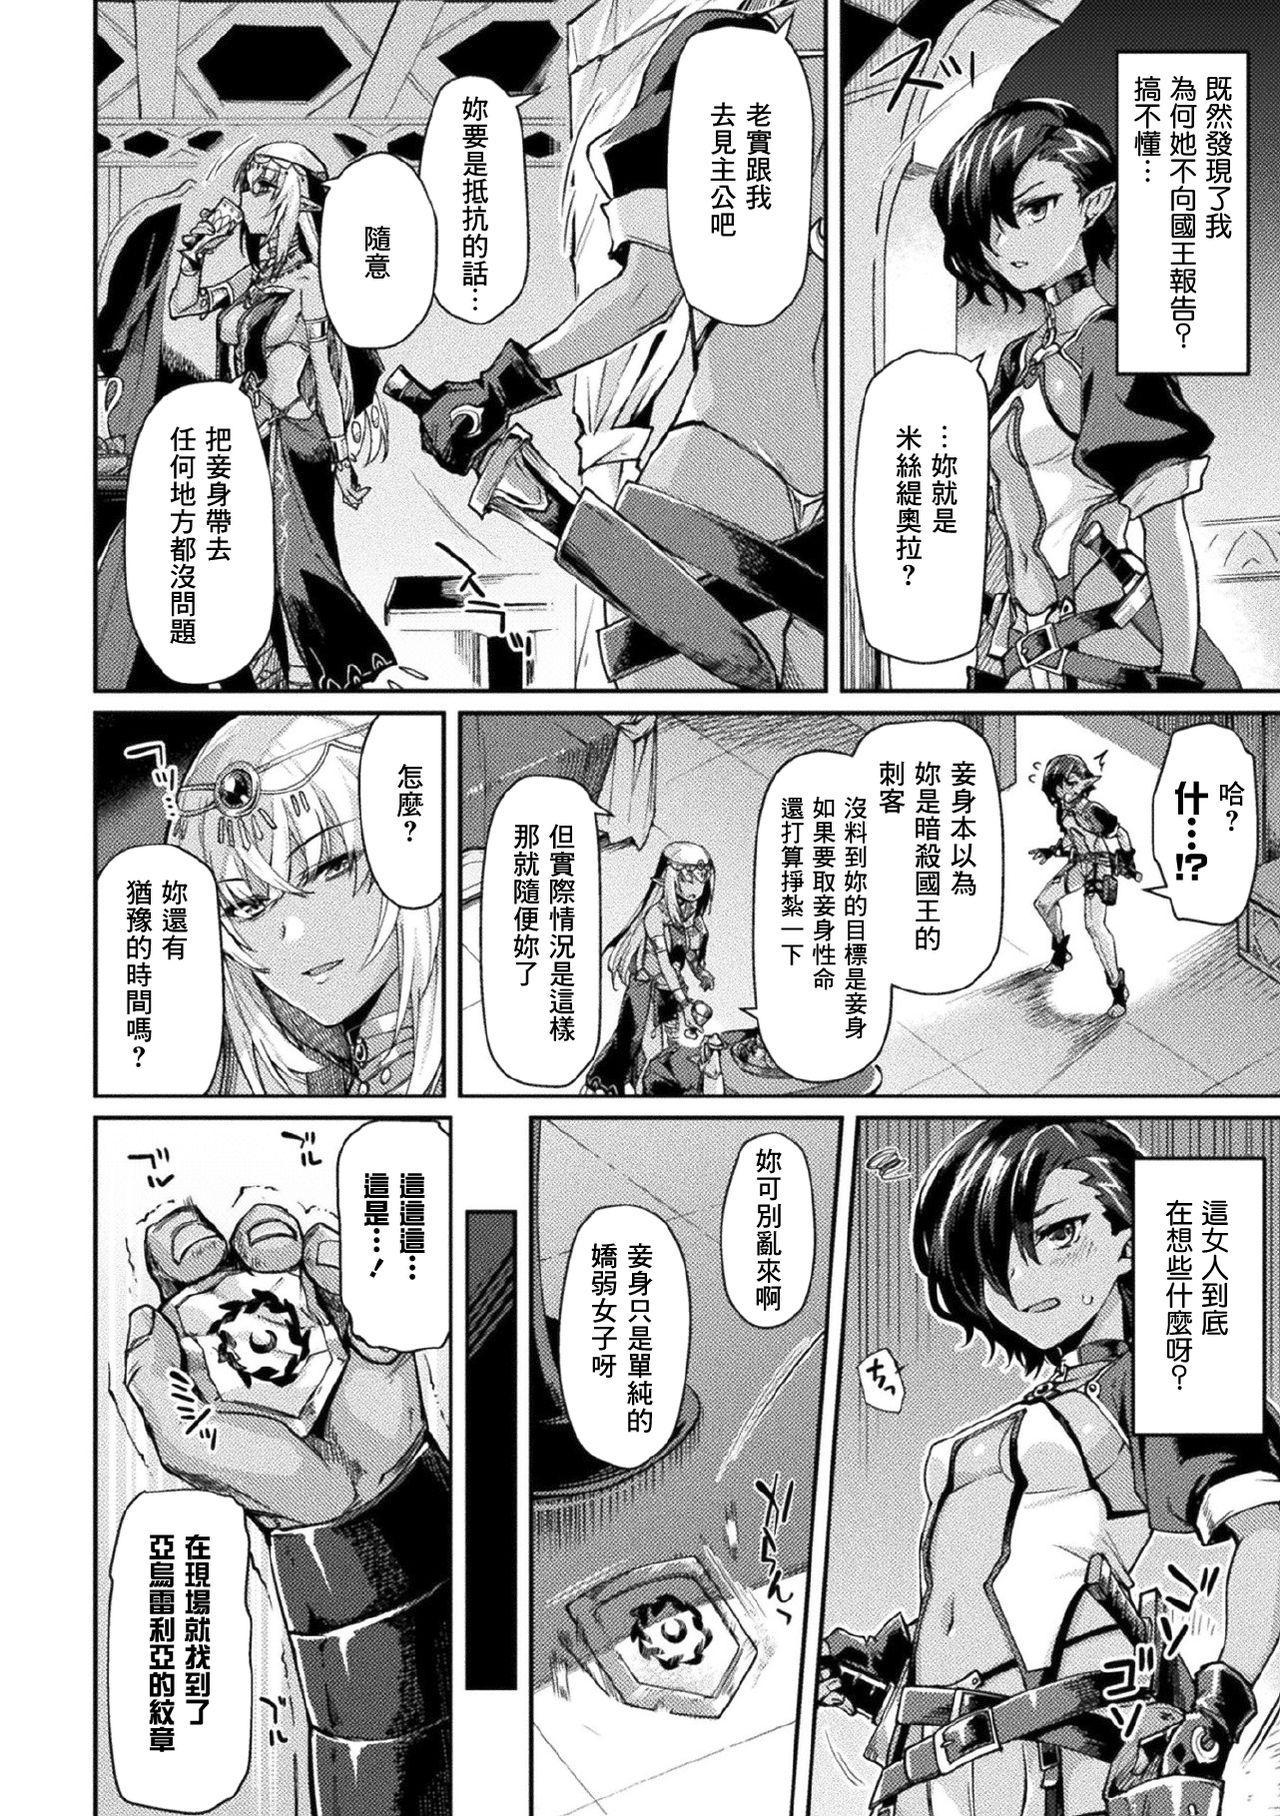 [Tsukitokage] Kuroinu II ~Inyoku ni Somaru Haitoku no Miyako, Futatabi~ THE COMIC Chapter 6 (Kukkoro Heroines Vol. 7) [Digital] [Chinese] [鬼畜王漢化組] [Digital] 4